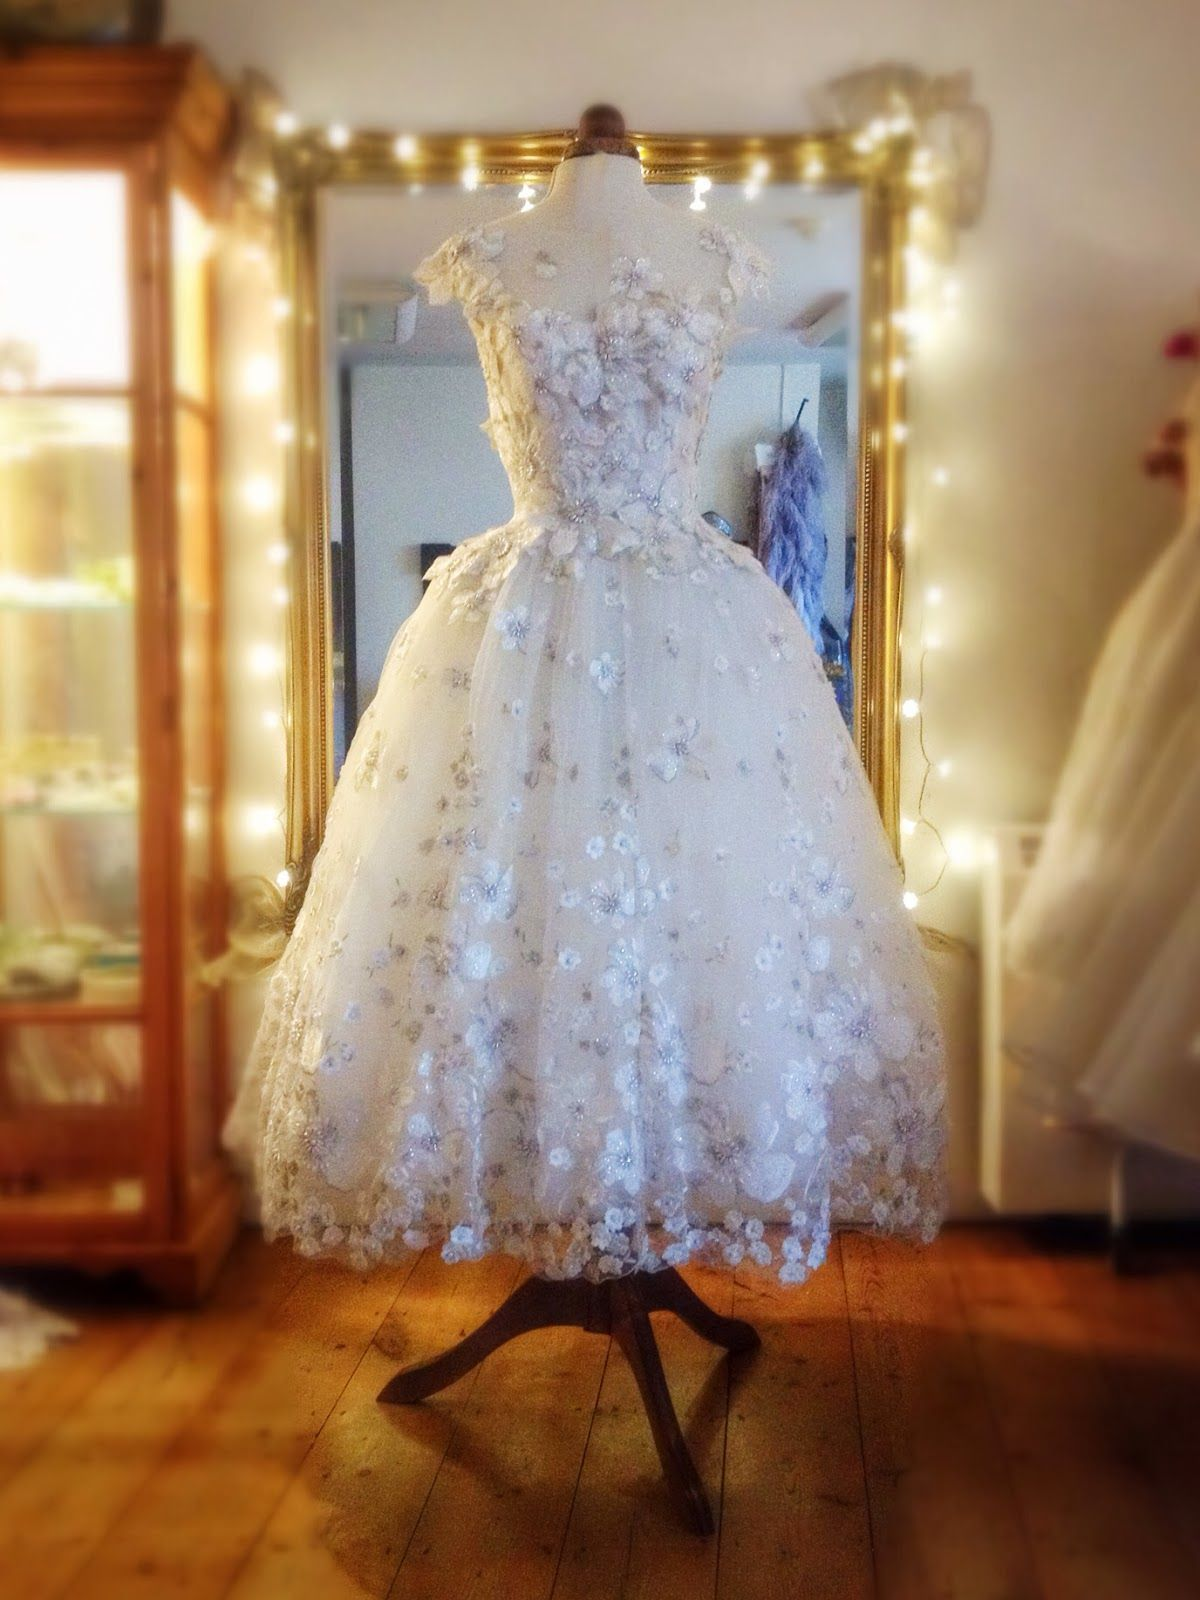 Joanne Fleming Design Tamara Flower Strewn Tulle Ballerina Wedding Dress Ballerina Wedding Dress Ballerina Wedding Tea Length Wedding Dress [ 1600 x 1200 Pixel ]